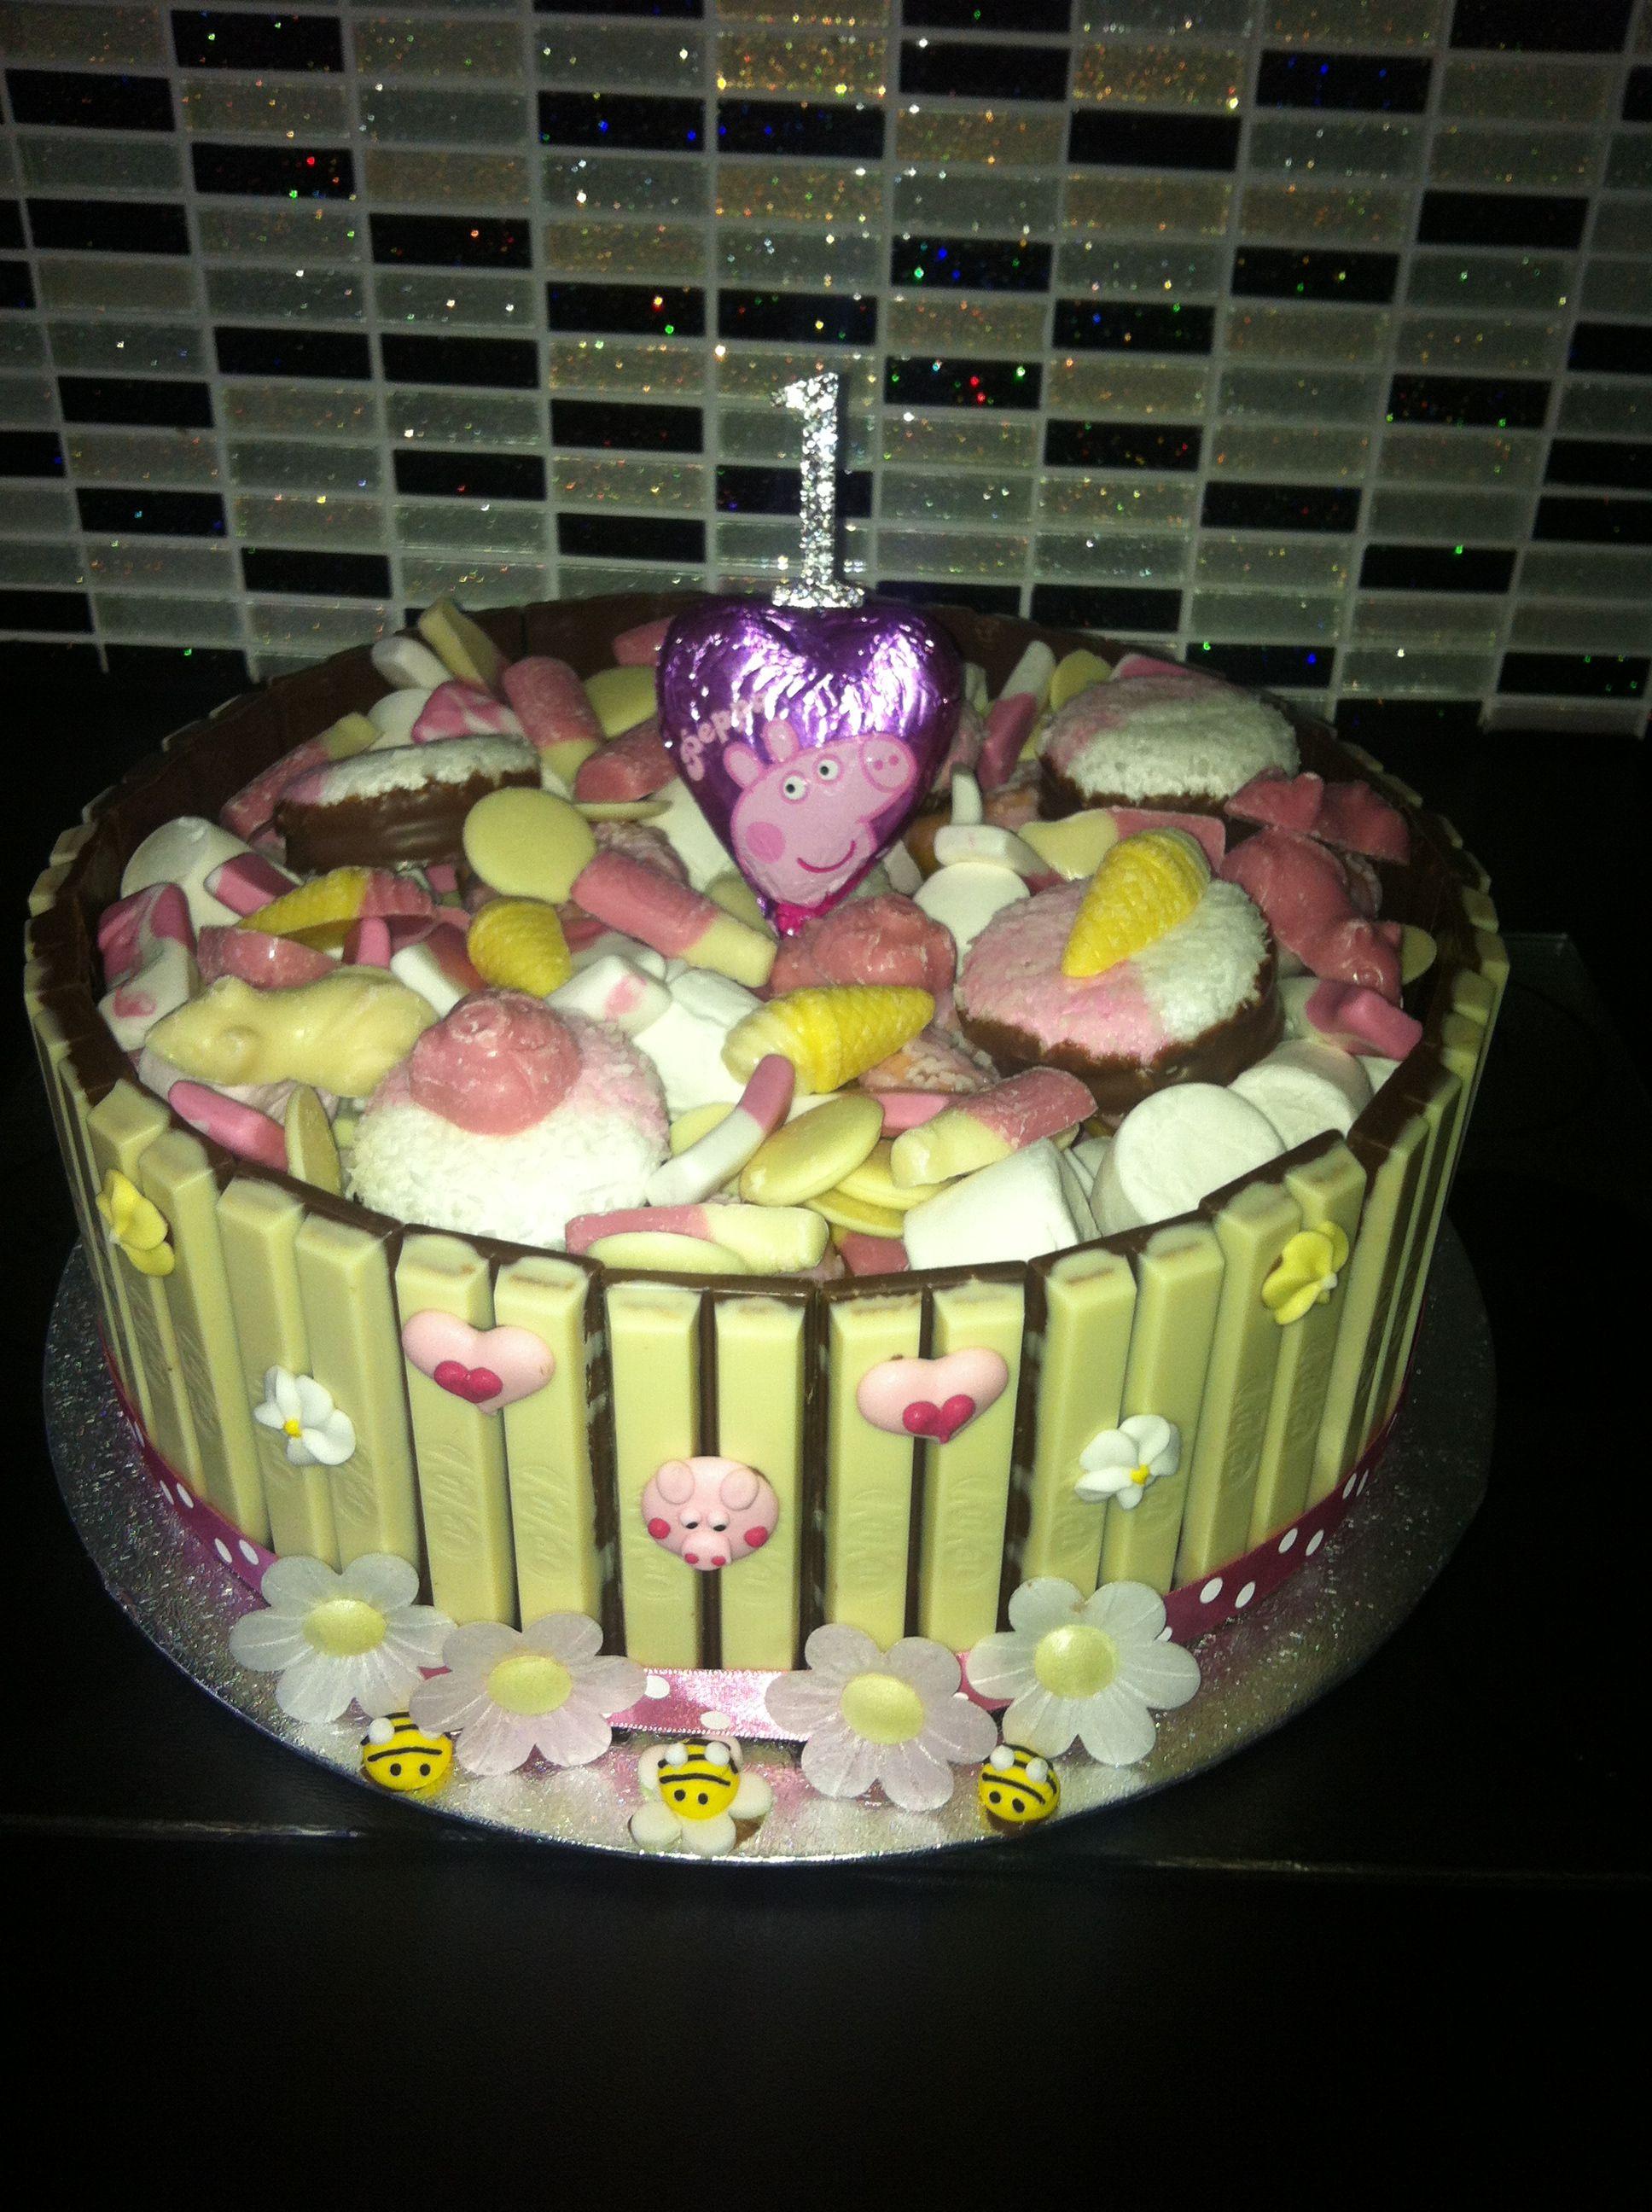 Kitkat cake - Peppa Pig inspired x | All things chocolate | Pinterest